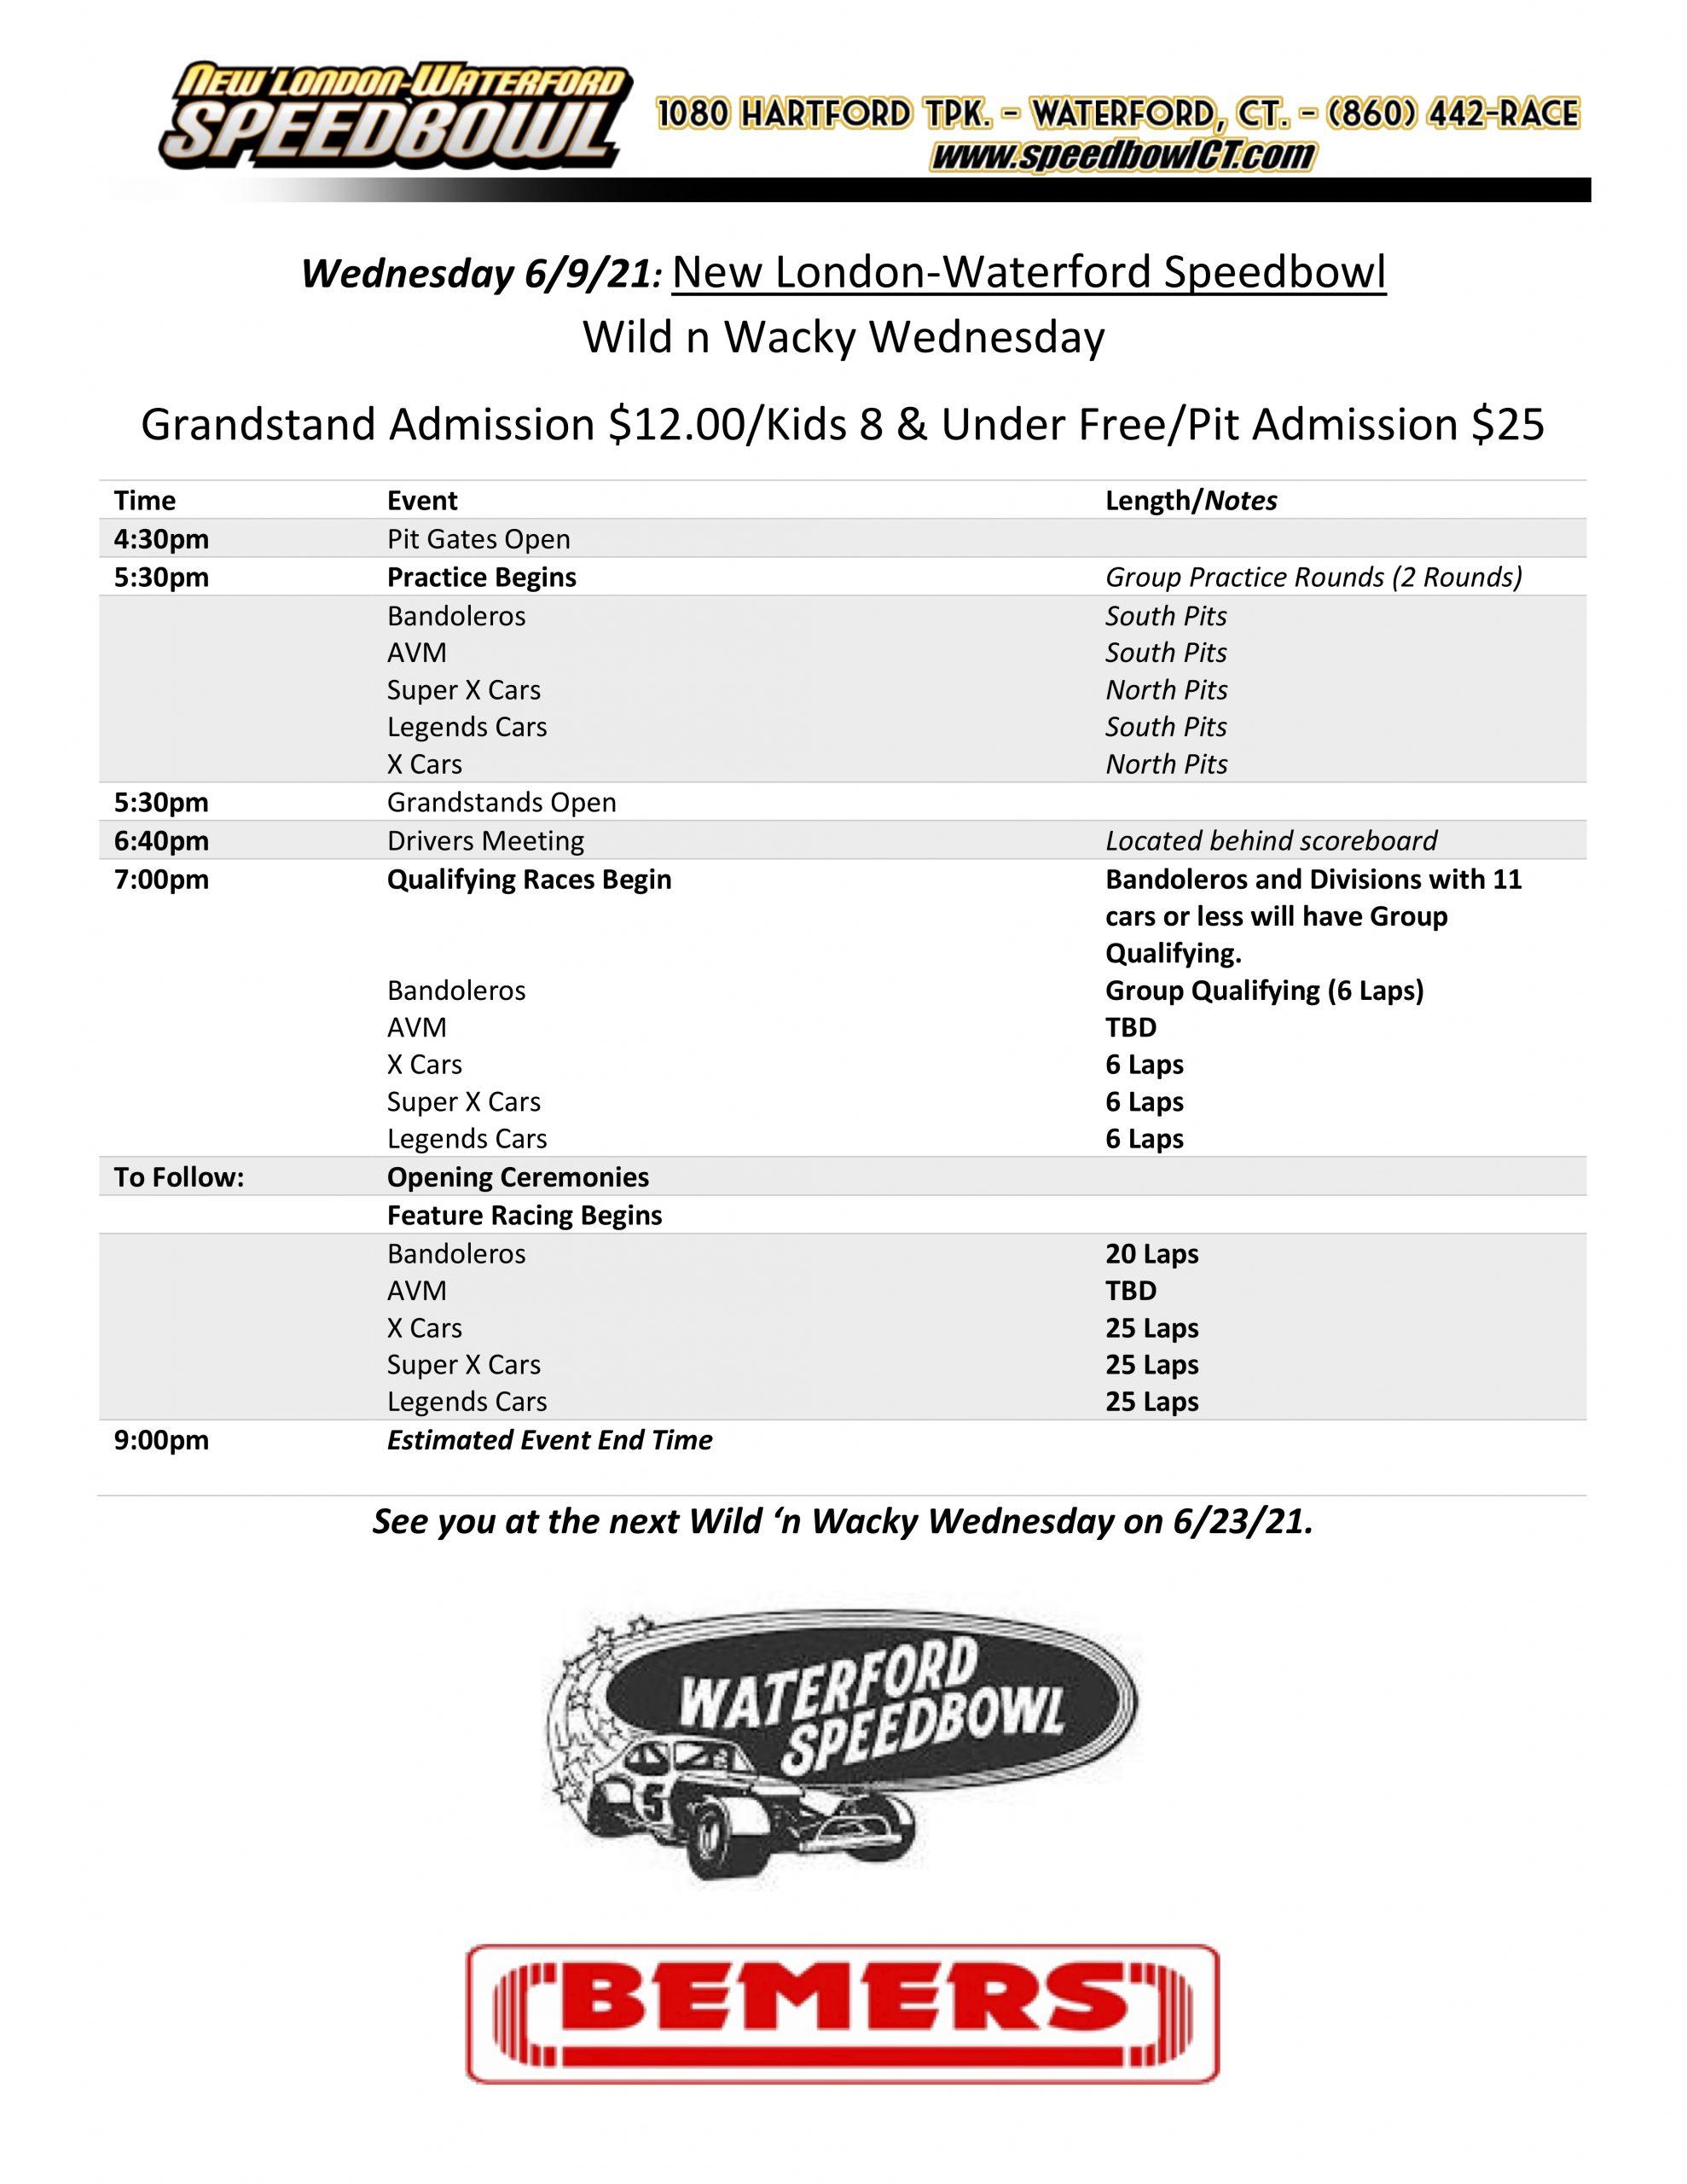 Wild & Wacky Wednesday Schedule